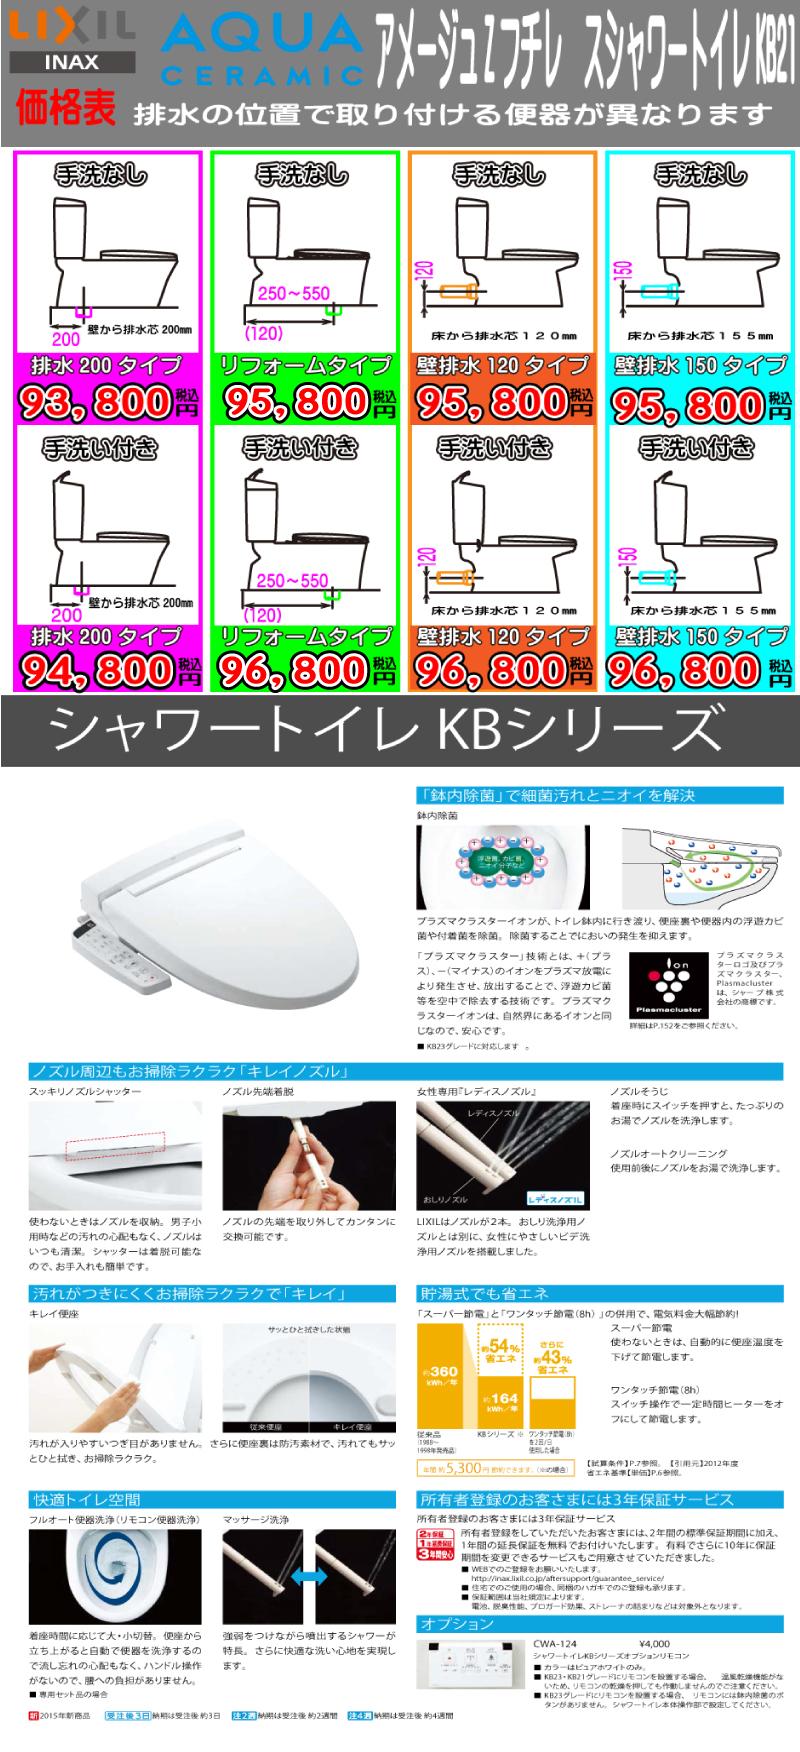 INAX アメージュZ AQUA+KB21トイレ 価格表